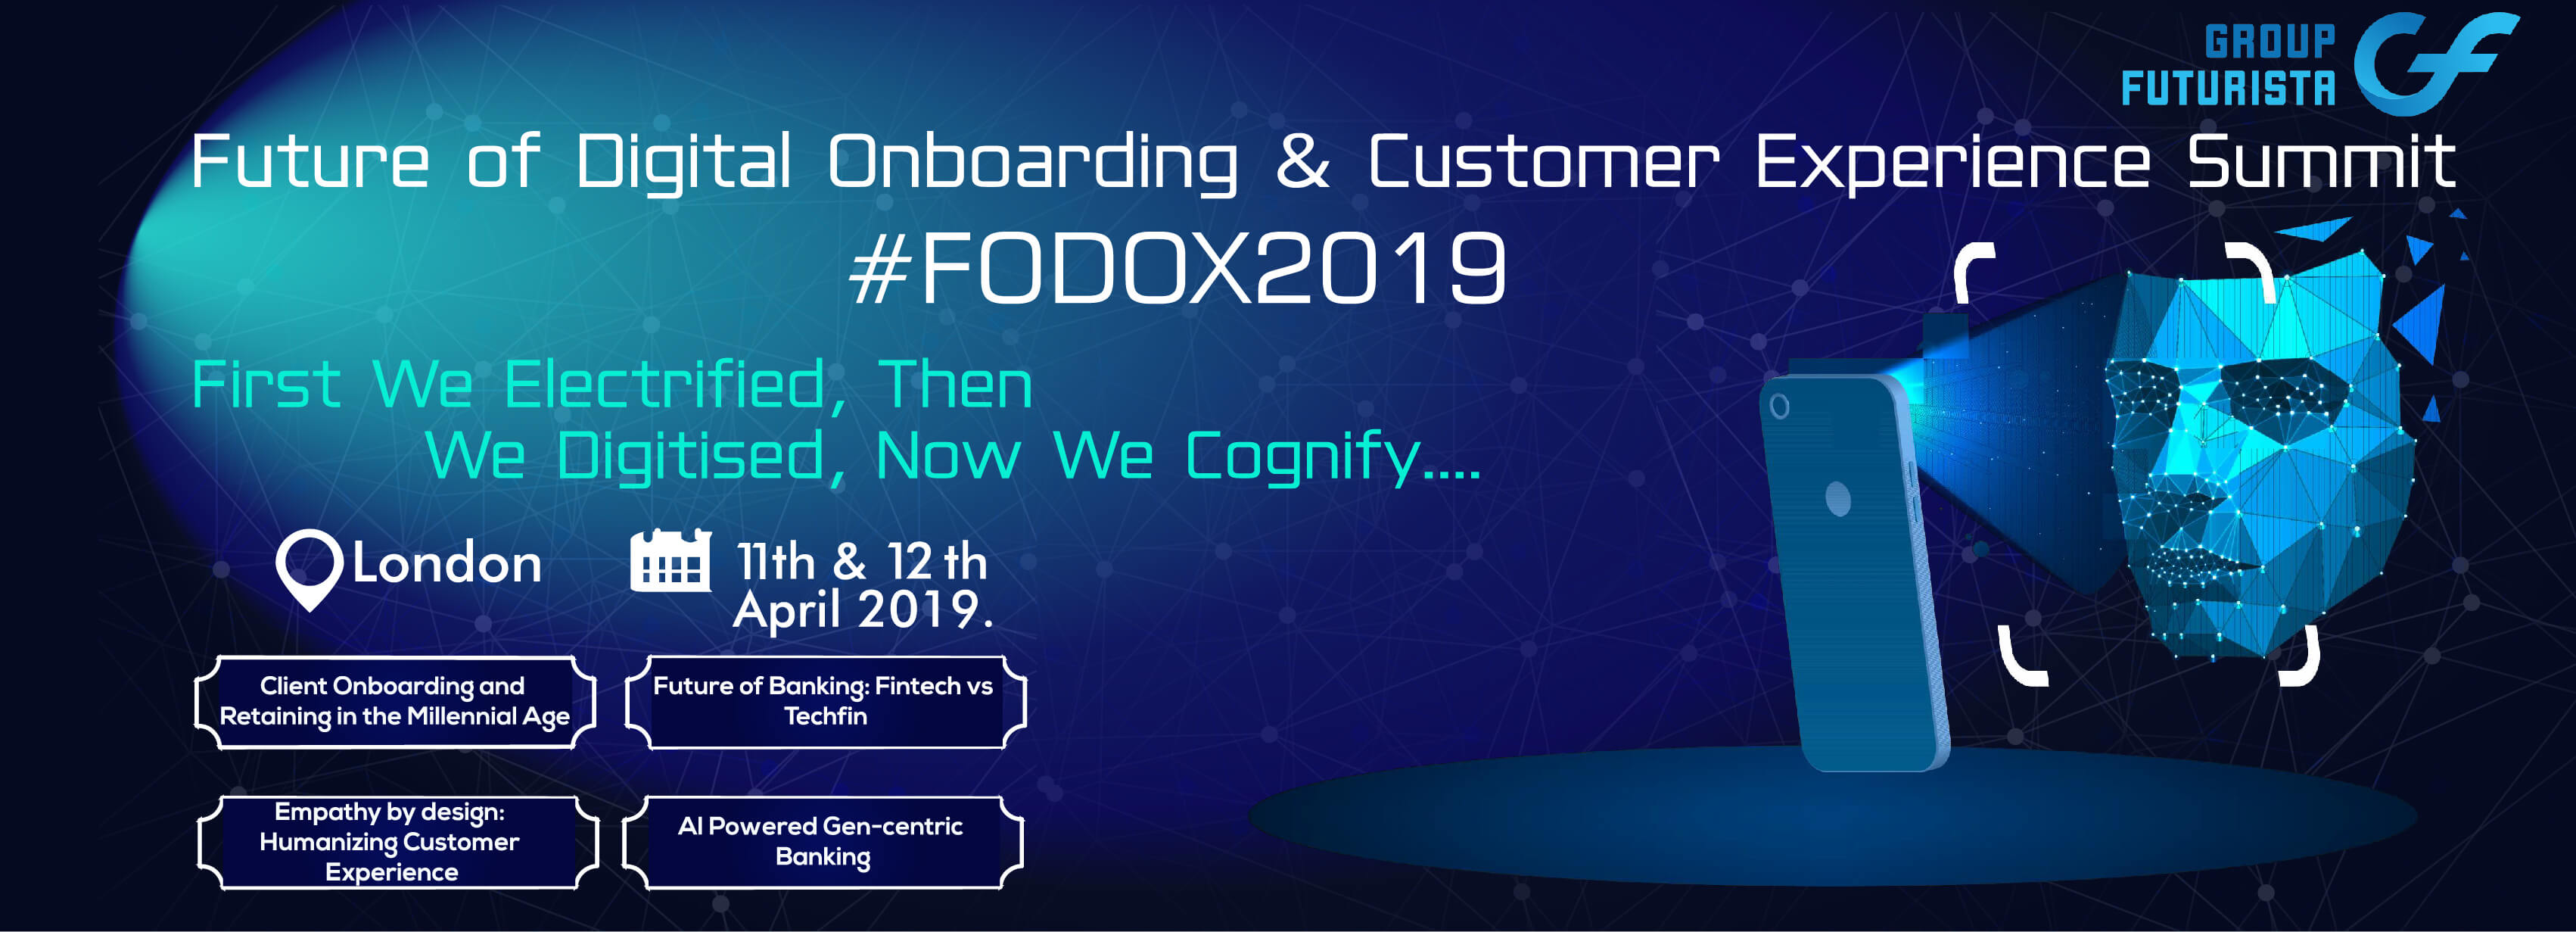 Fodox_2019_London